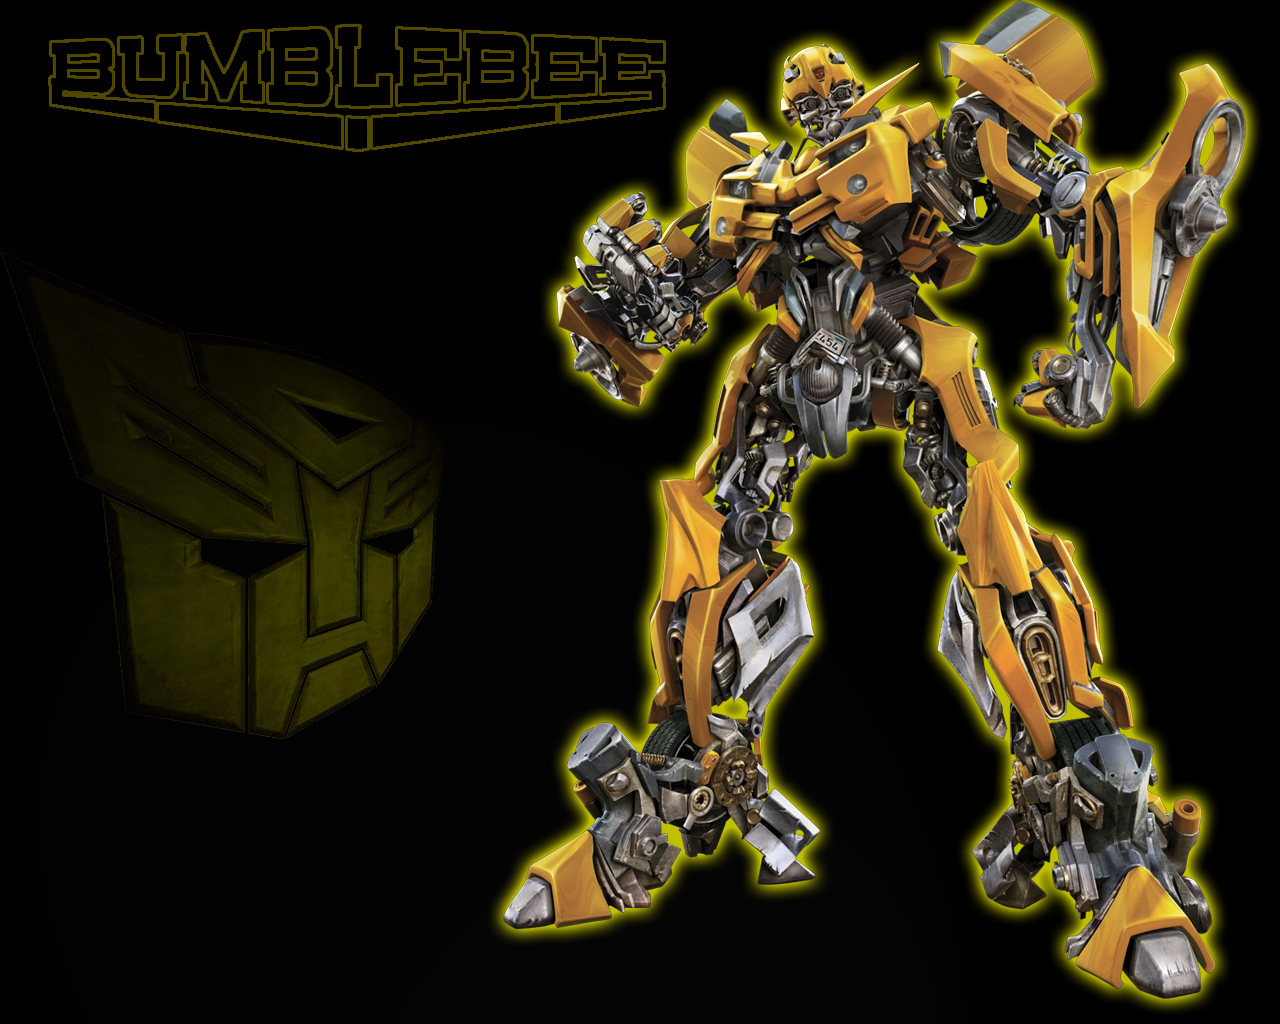 Transformers Transformers 1280x1024